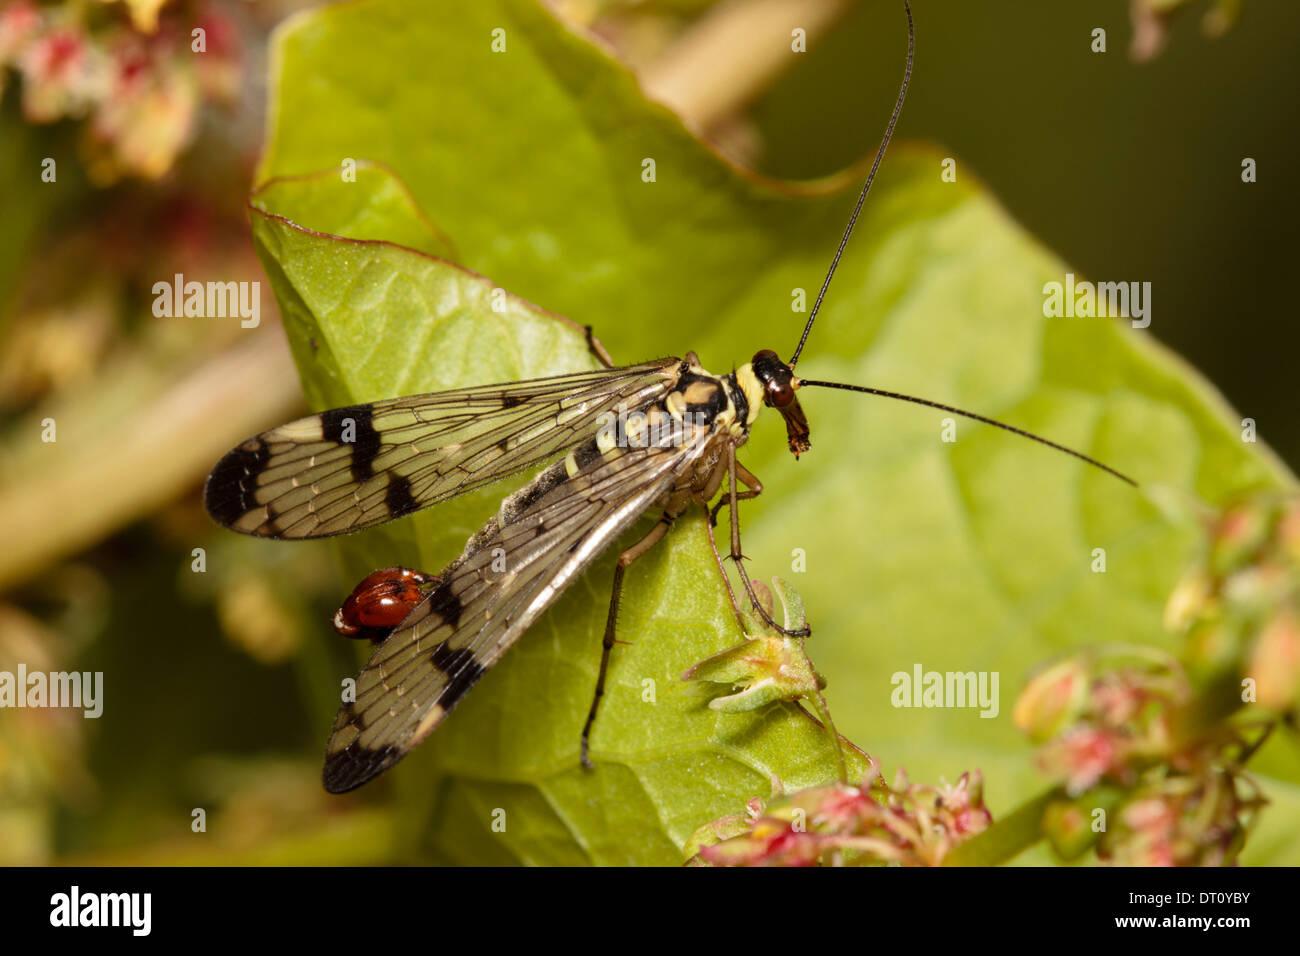 Male scorpion fly, Panorpa communis - Stock Image